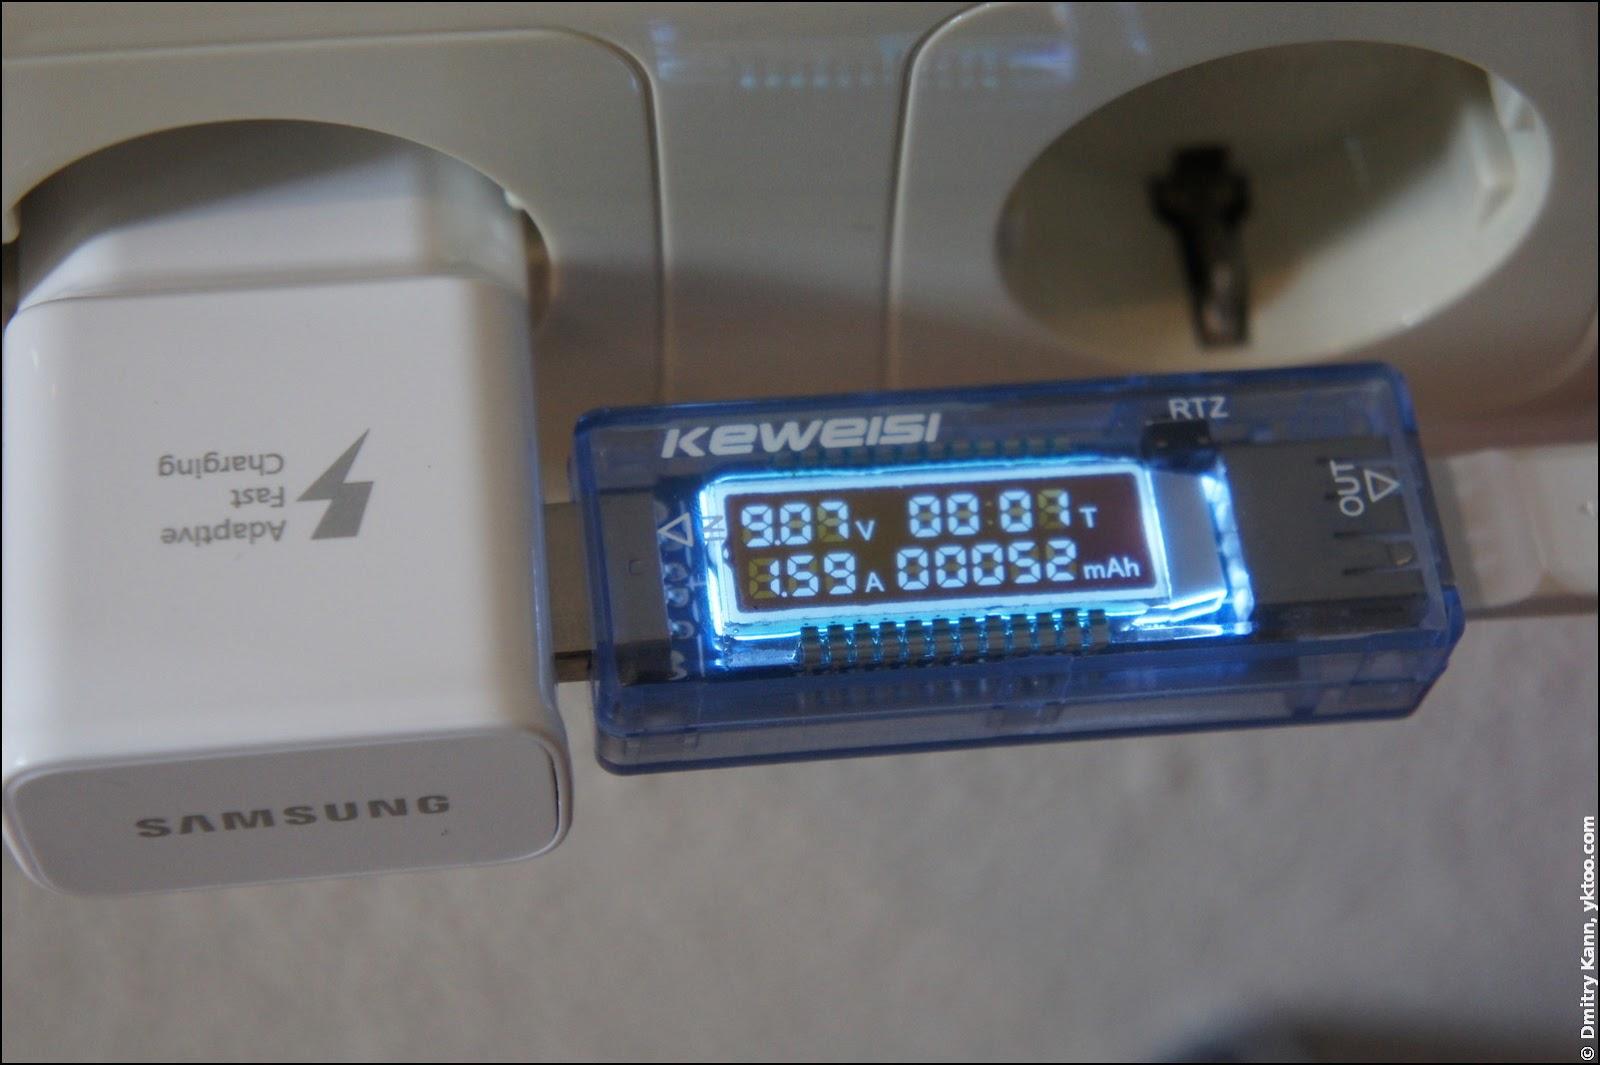 Samsung DC adapter, voltage 9 V.